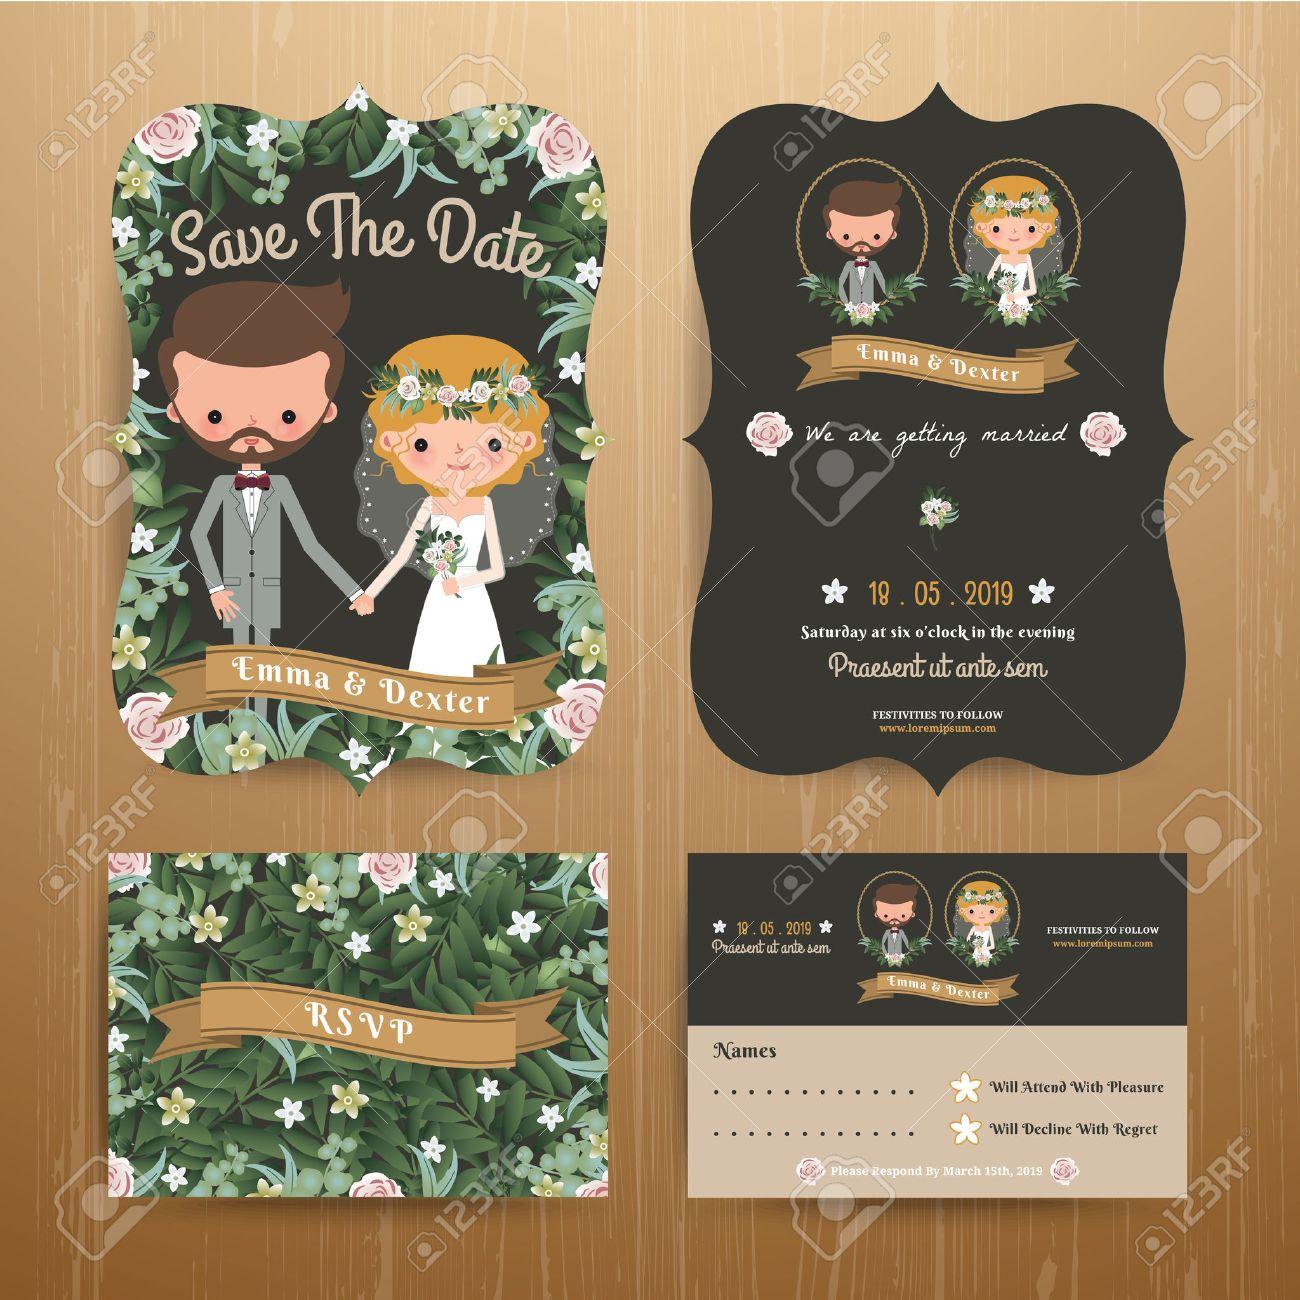 Rustic bohemian cartoon couple wedding card template set on wood background Stock Vector - 44118418